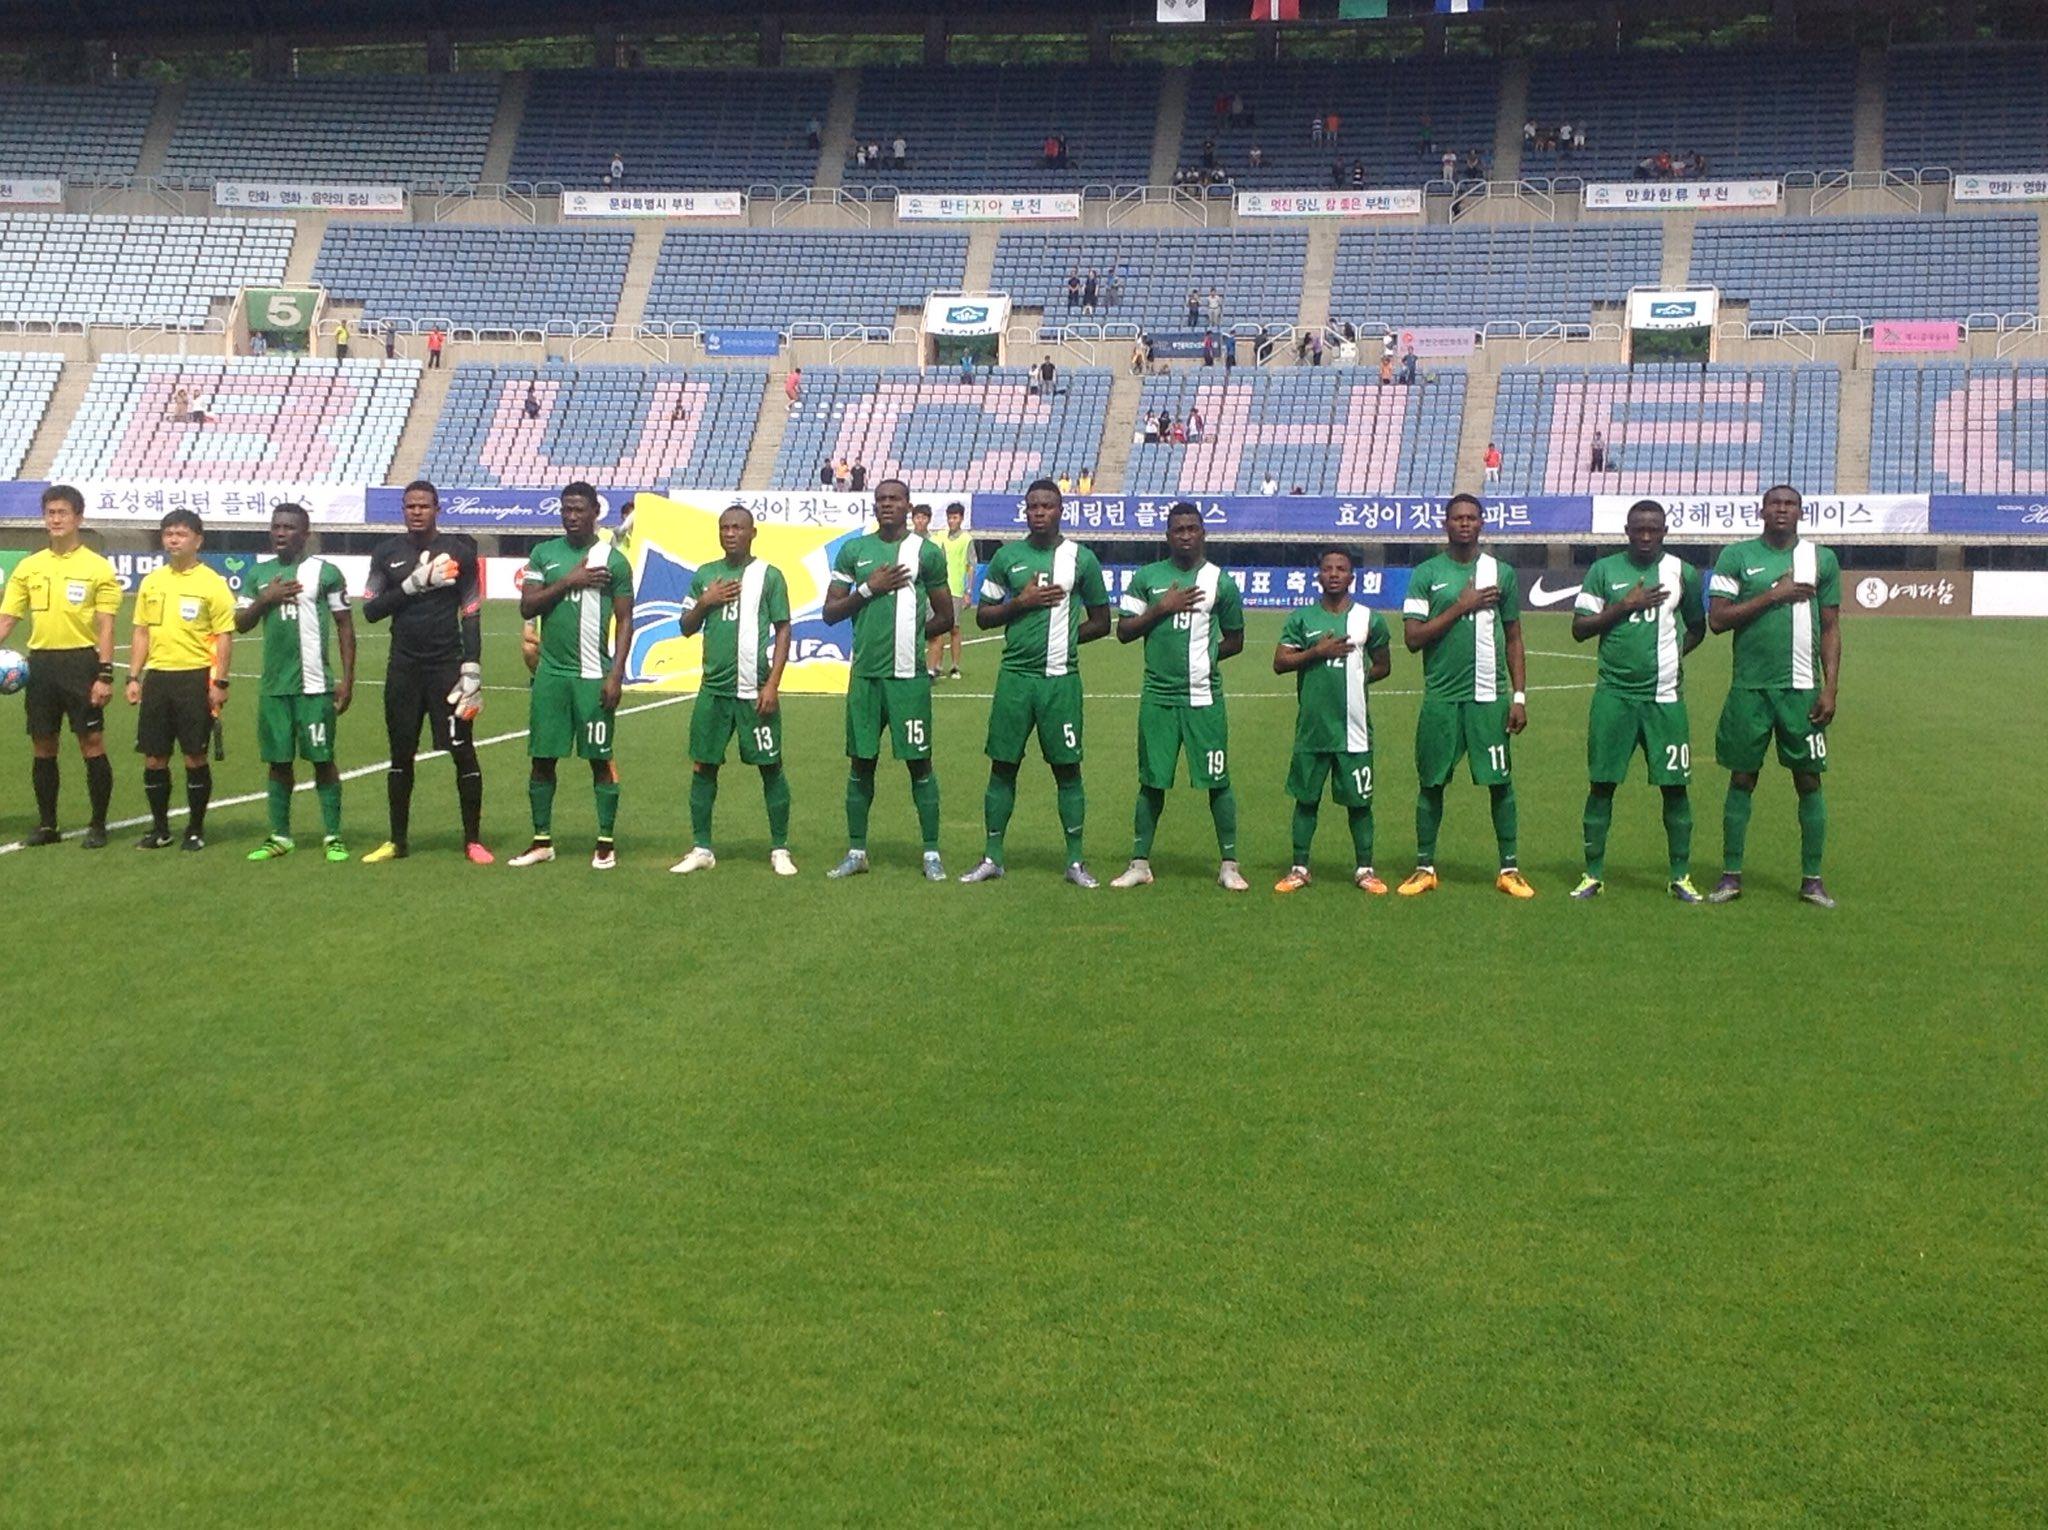 Suwon Tourney: U-23 Eagles Bounce Back To Beat Honduras